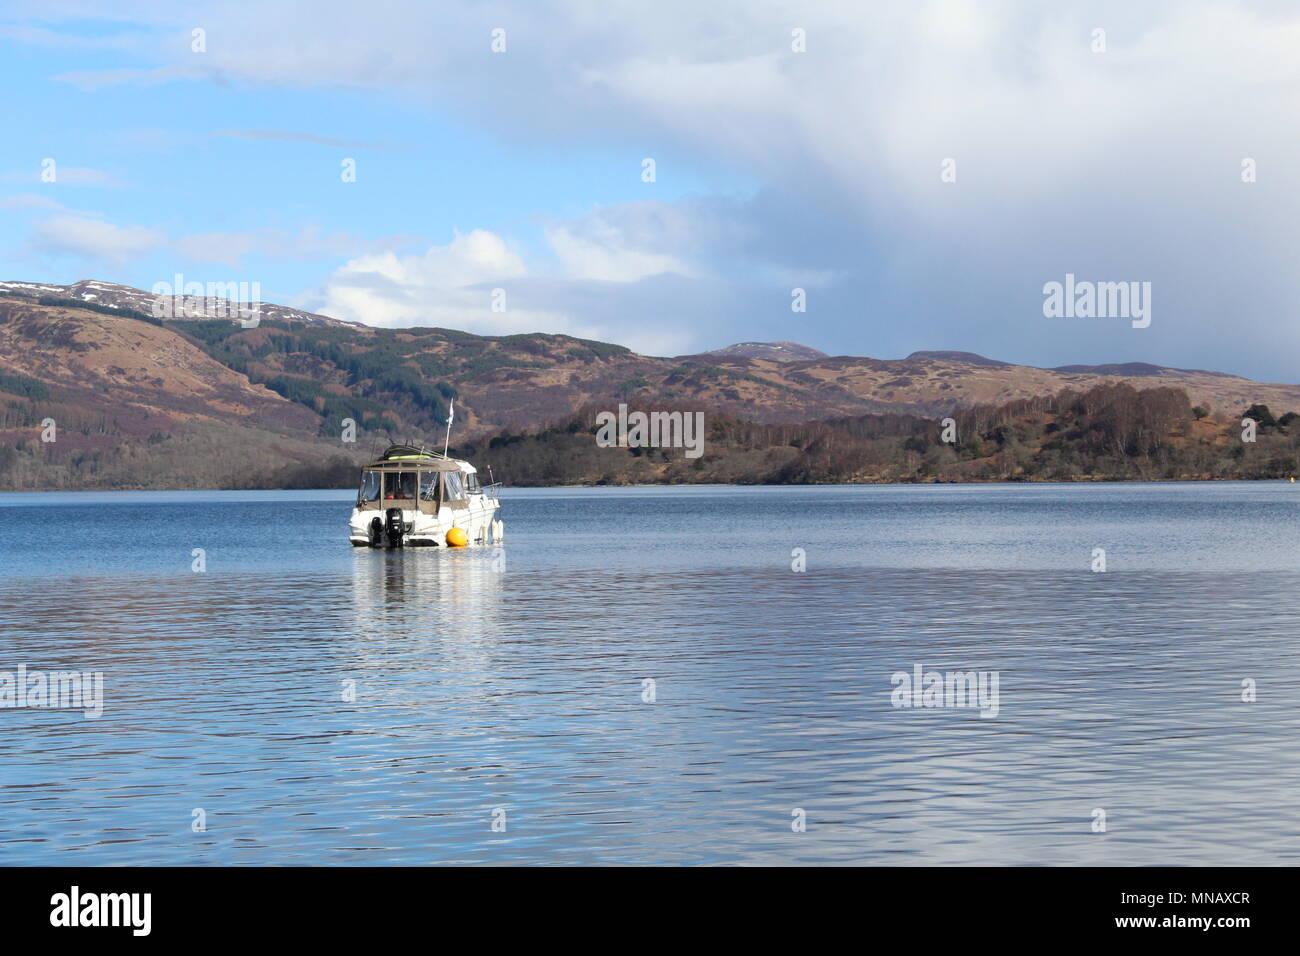 Loch Lomond, Scotland - Stock Image